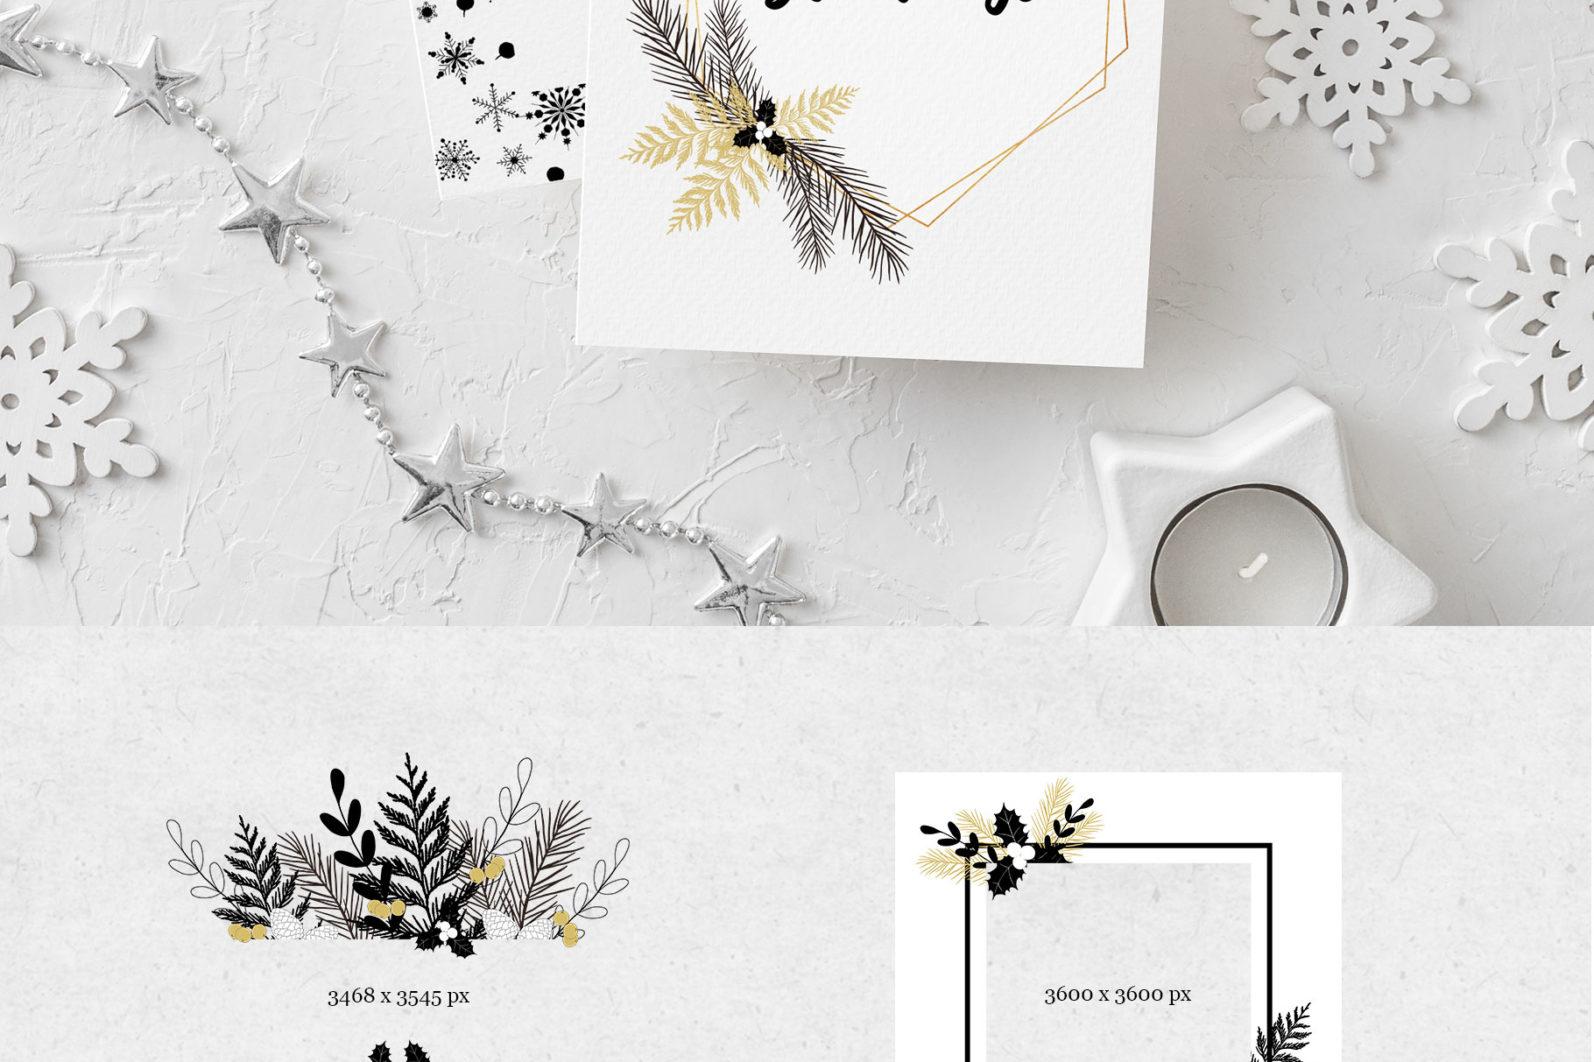 Black & Gold Christmas - chirstmas black gold frames page -